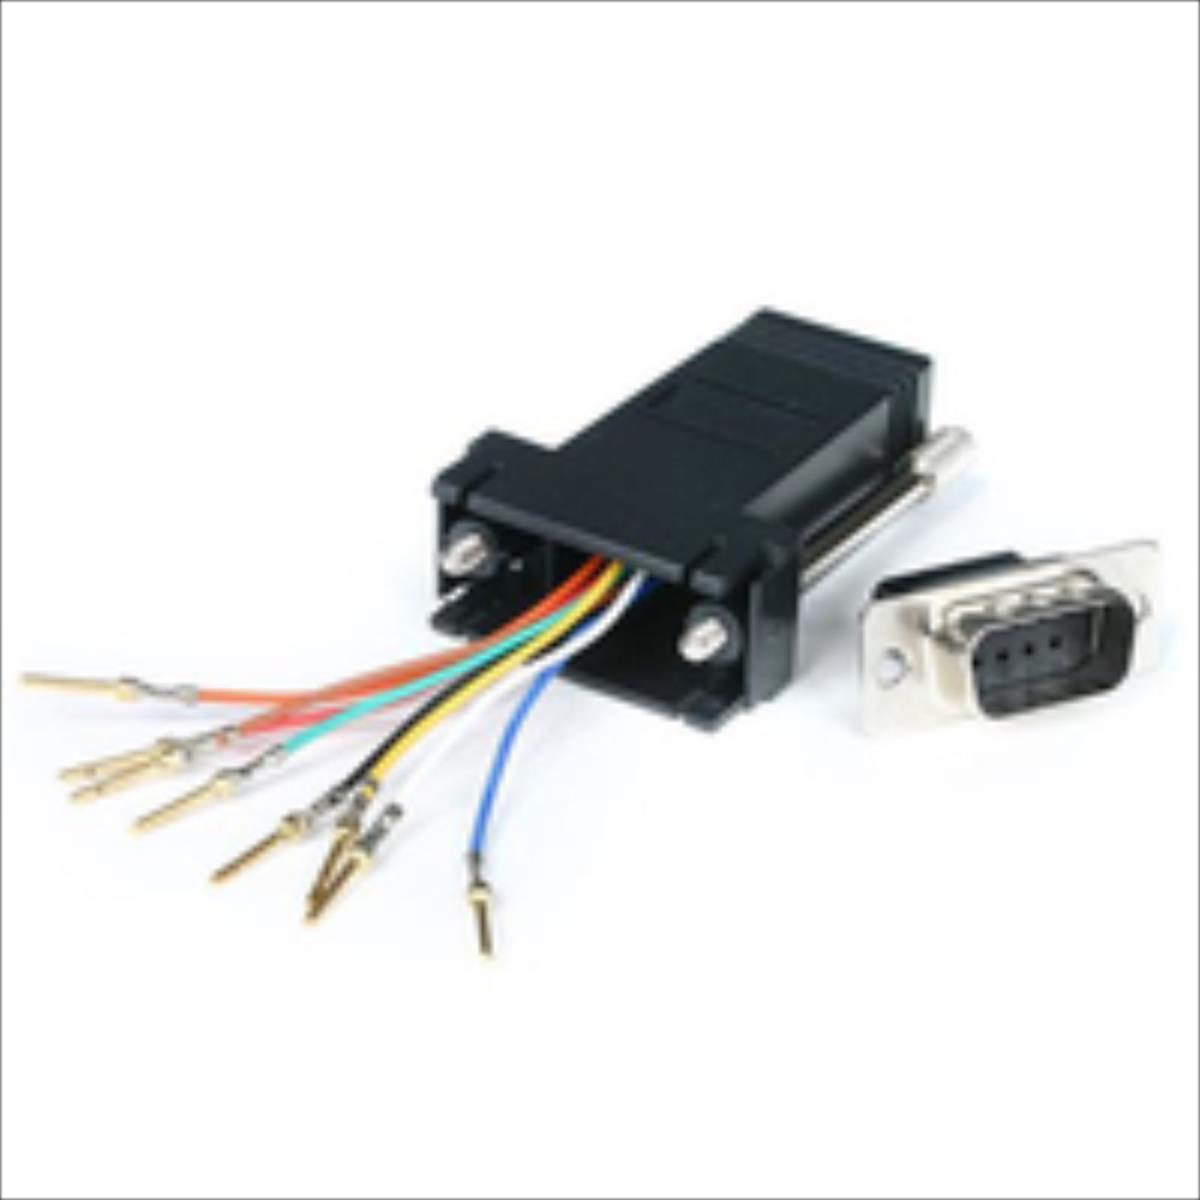 StarTech.com DB9 TO RJ45 MODULAR ADAPTER  GC98MF GC98MF adapteris